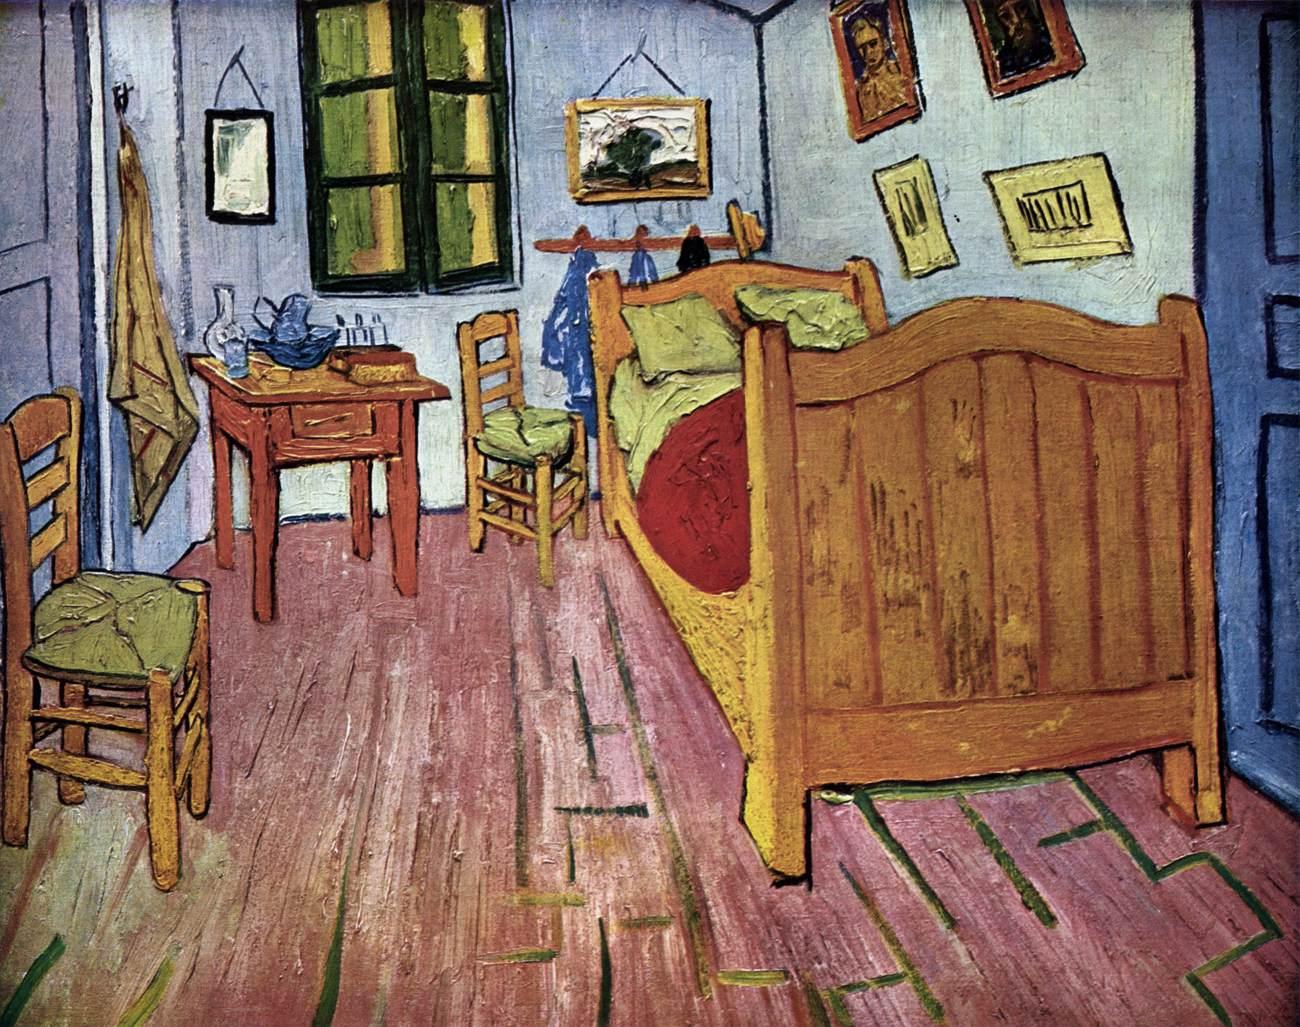 Various paintings arles september 1888 april 1889 - Chambre a arles van gogh ...